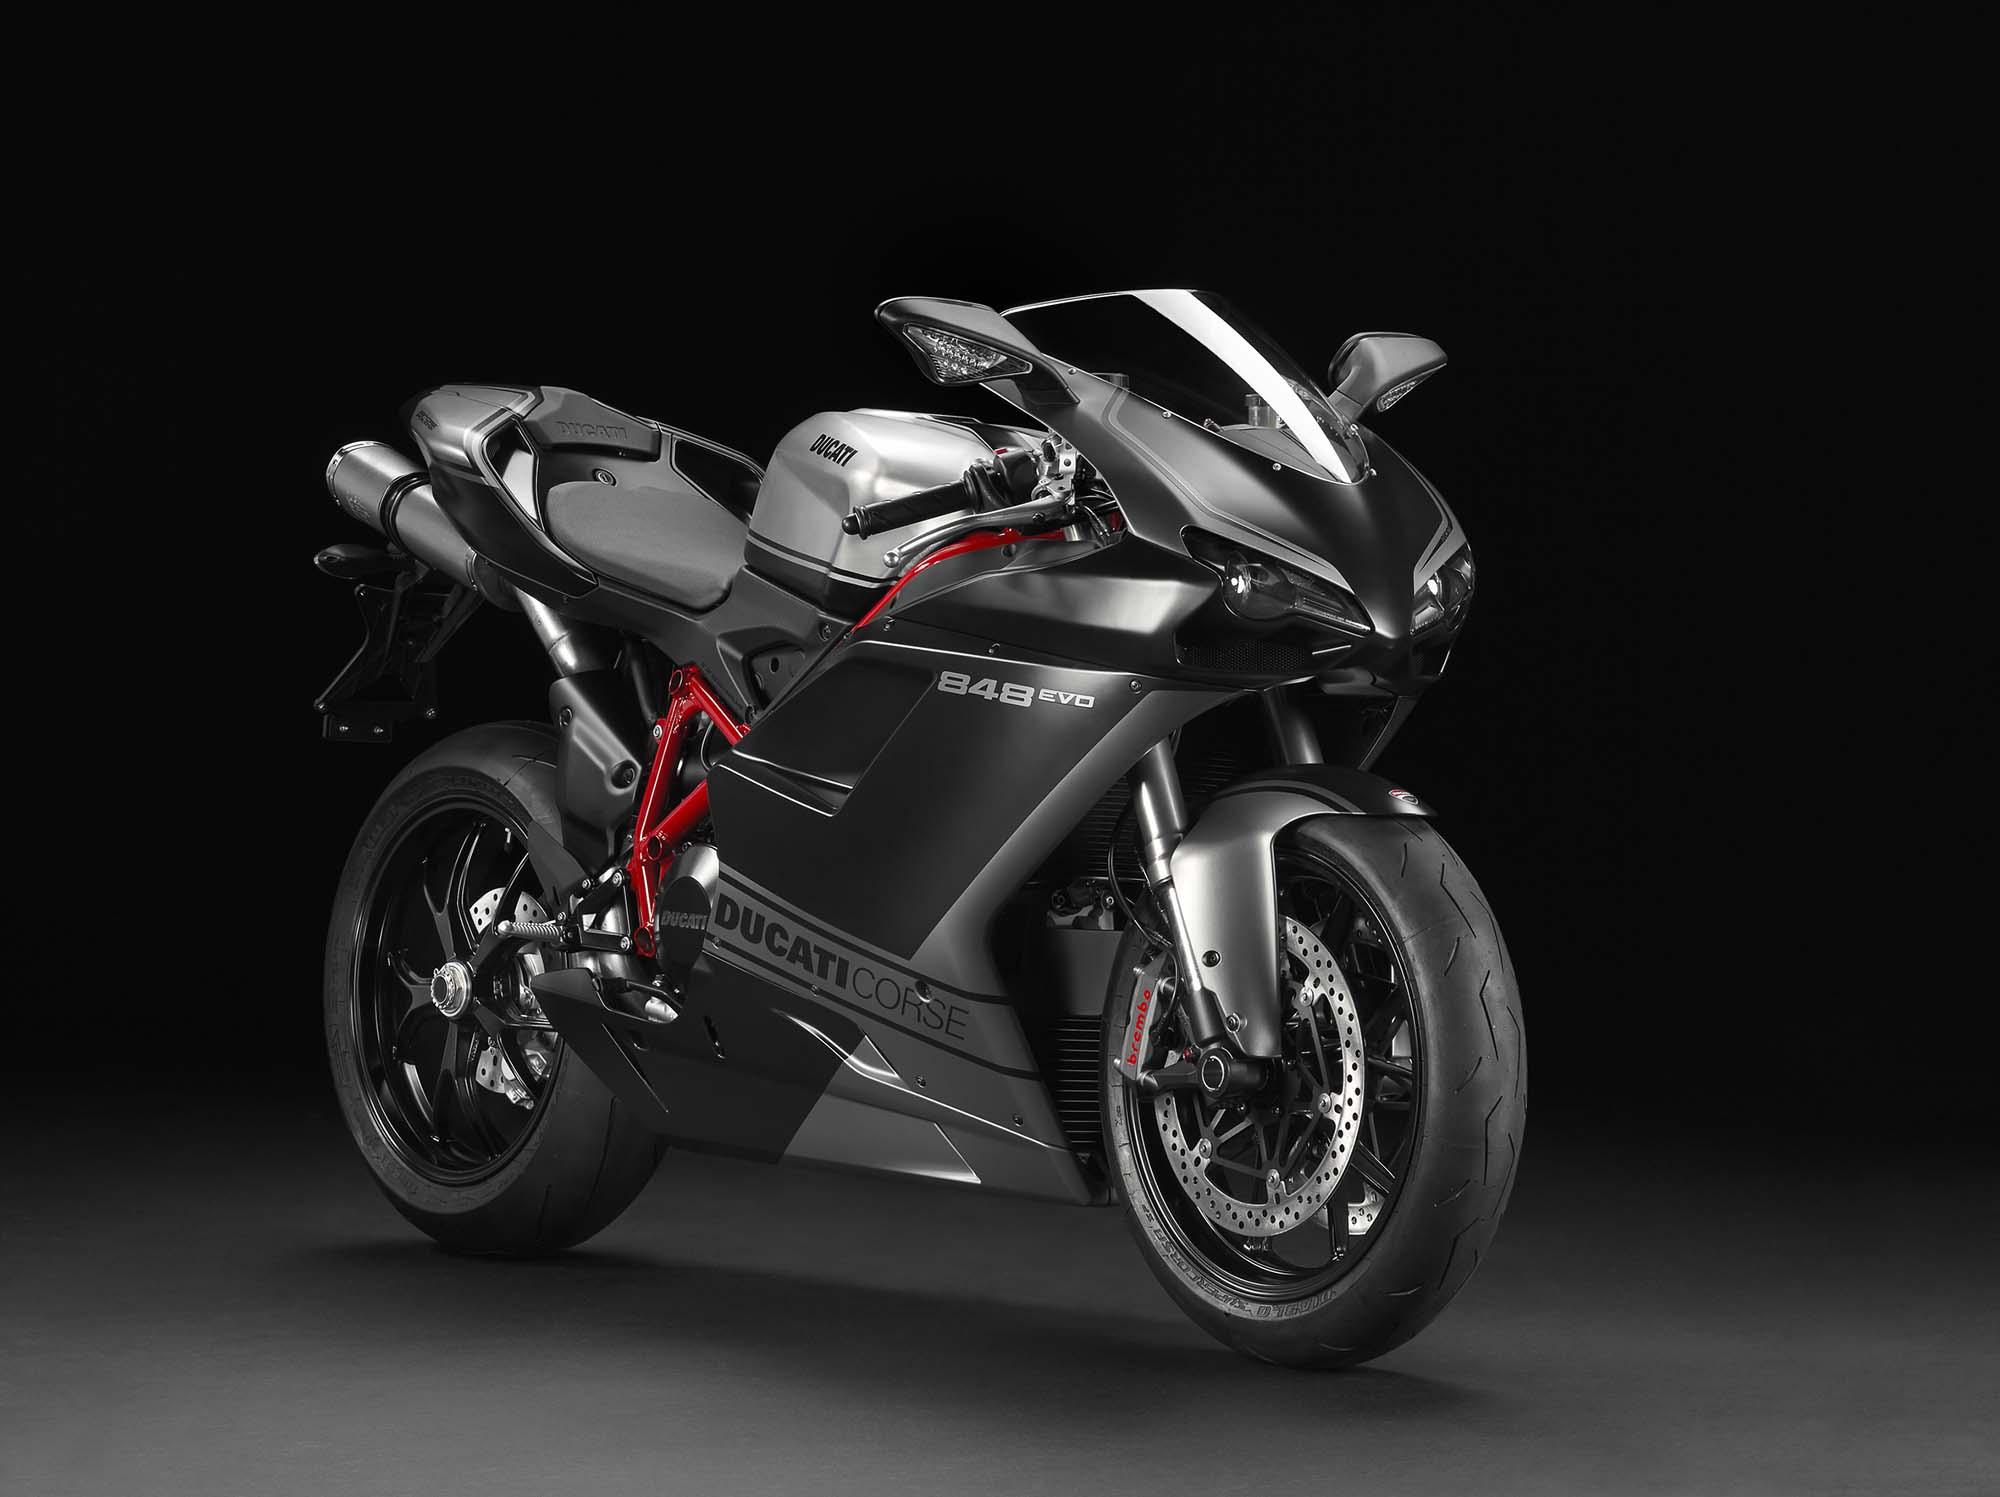 superbike - photo #45